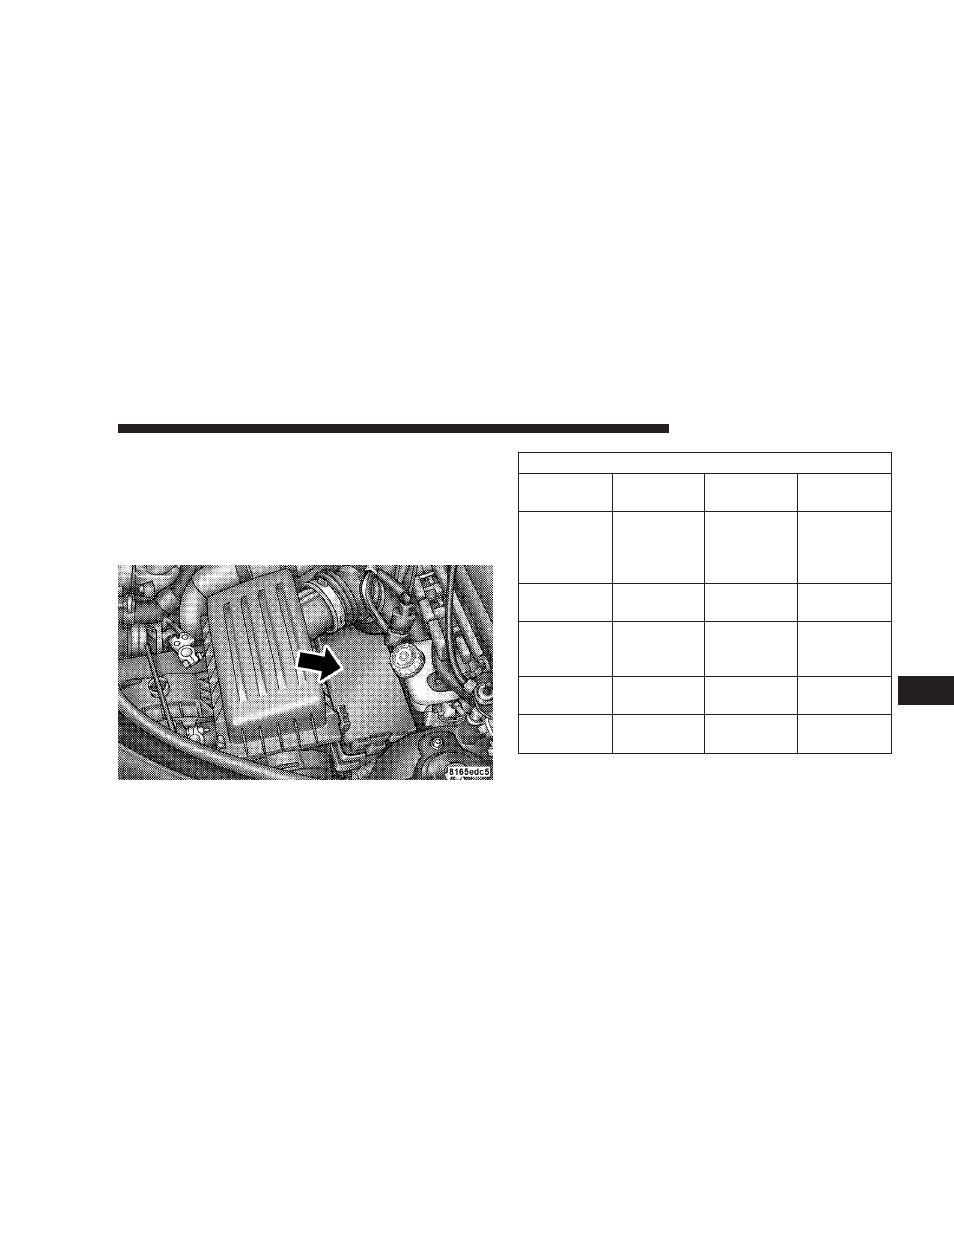 Integrated Module Ipm Chrysler 2008 Pt Cruiser Convertible User Manual Page 419 488